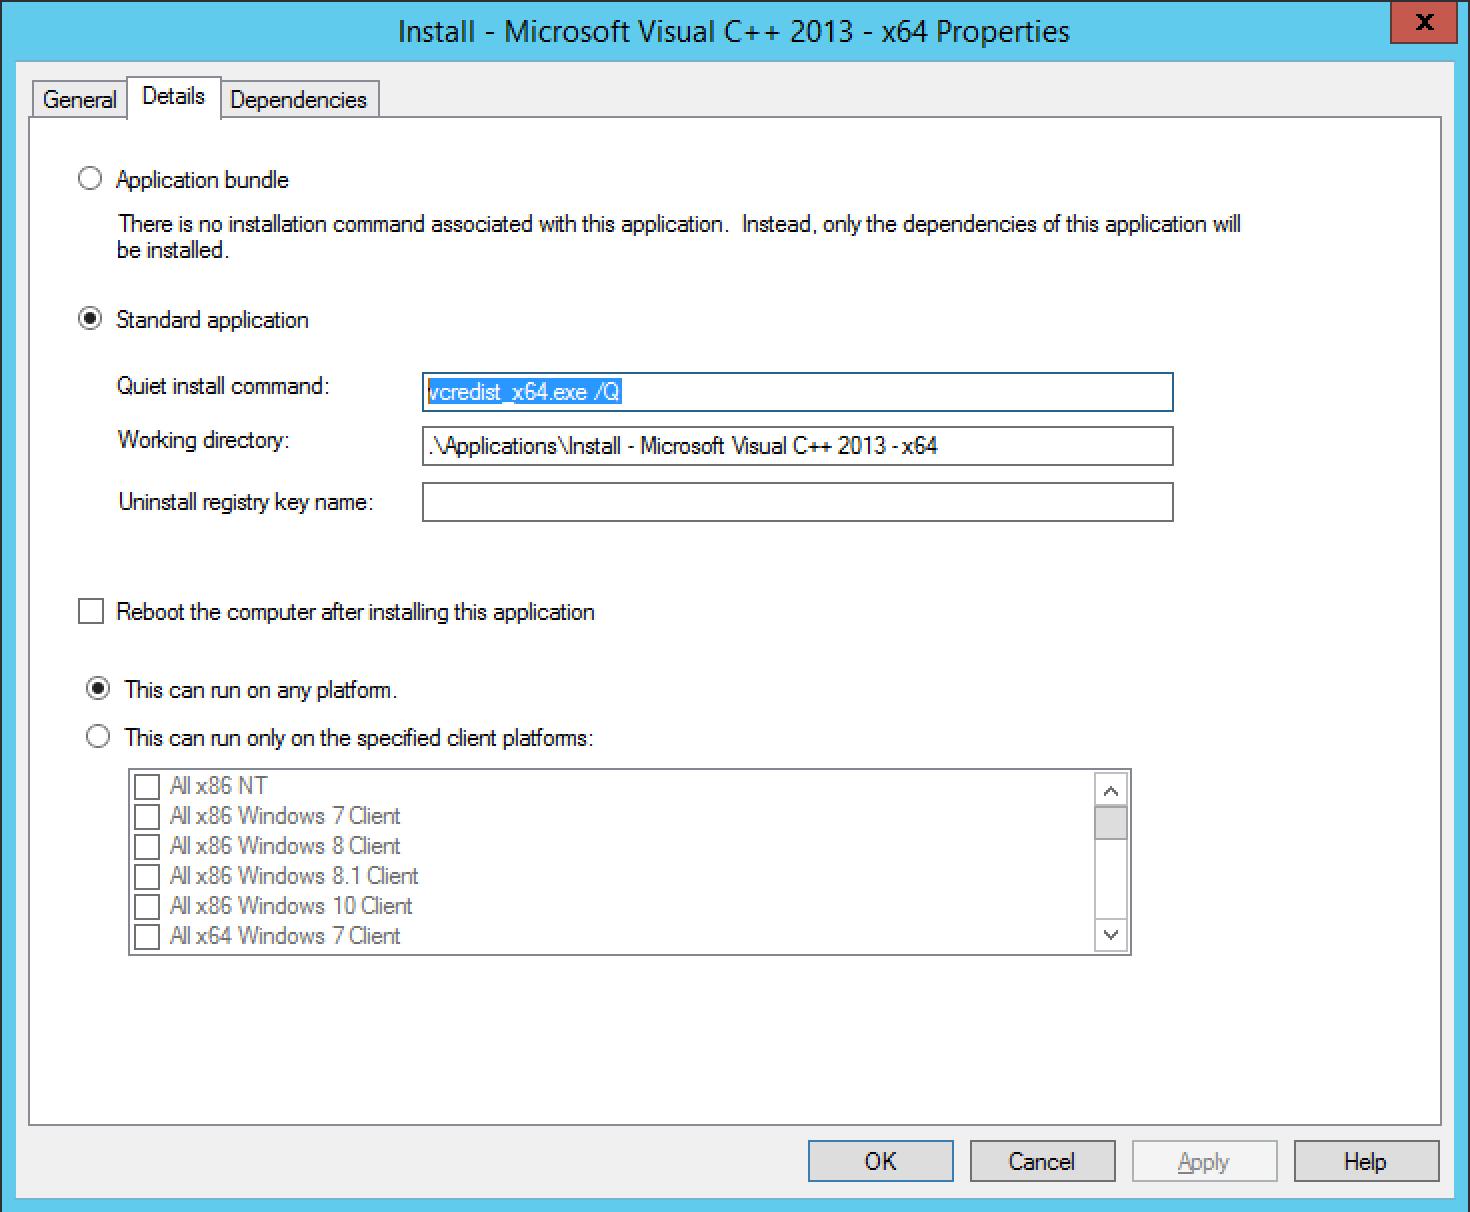 adobe acrobat pro dc 2015 serial key